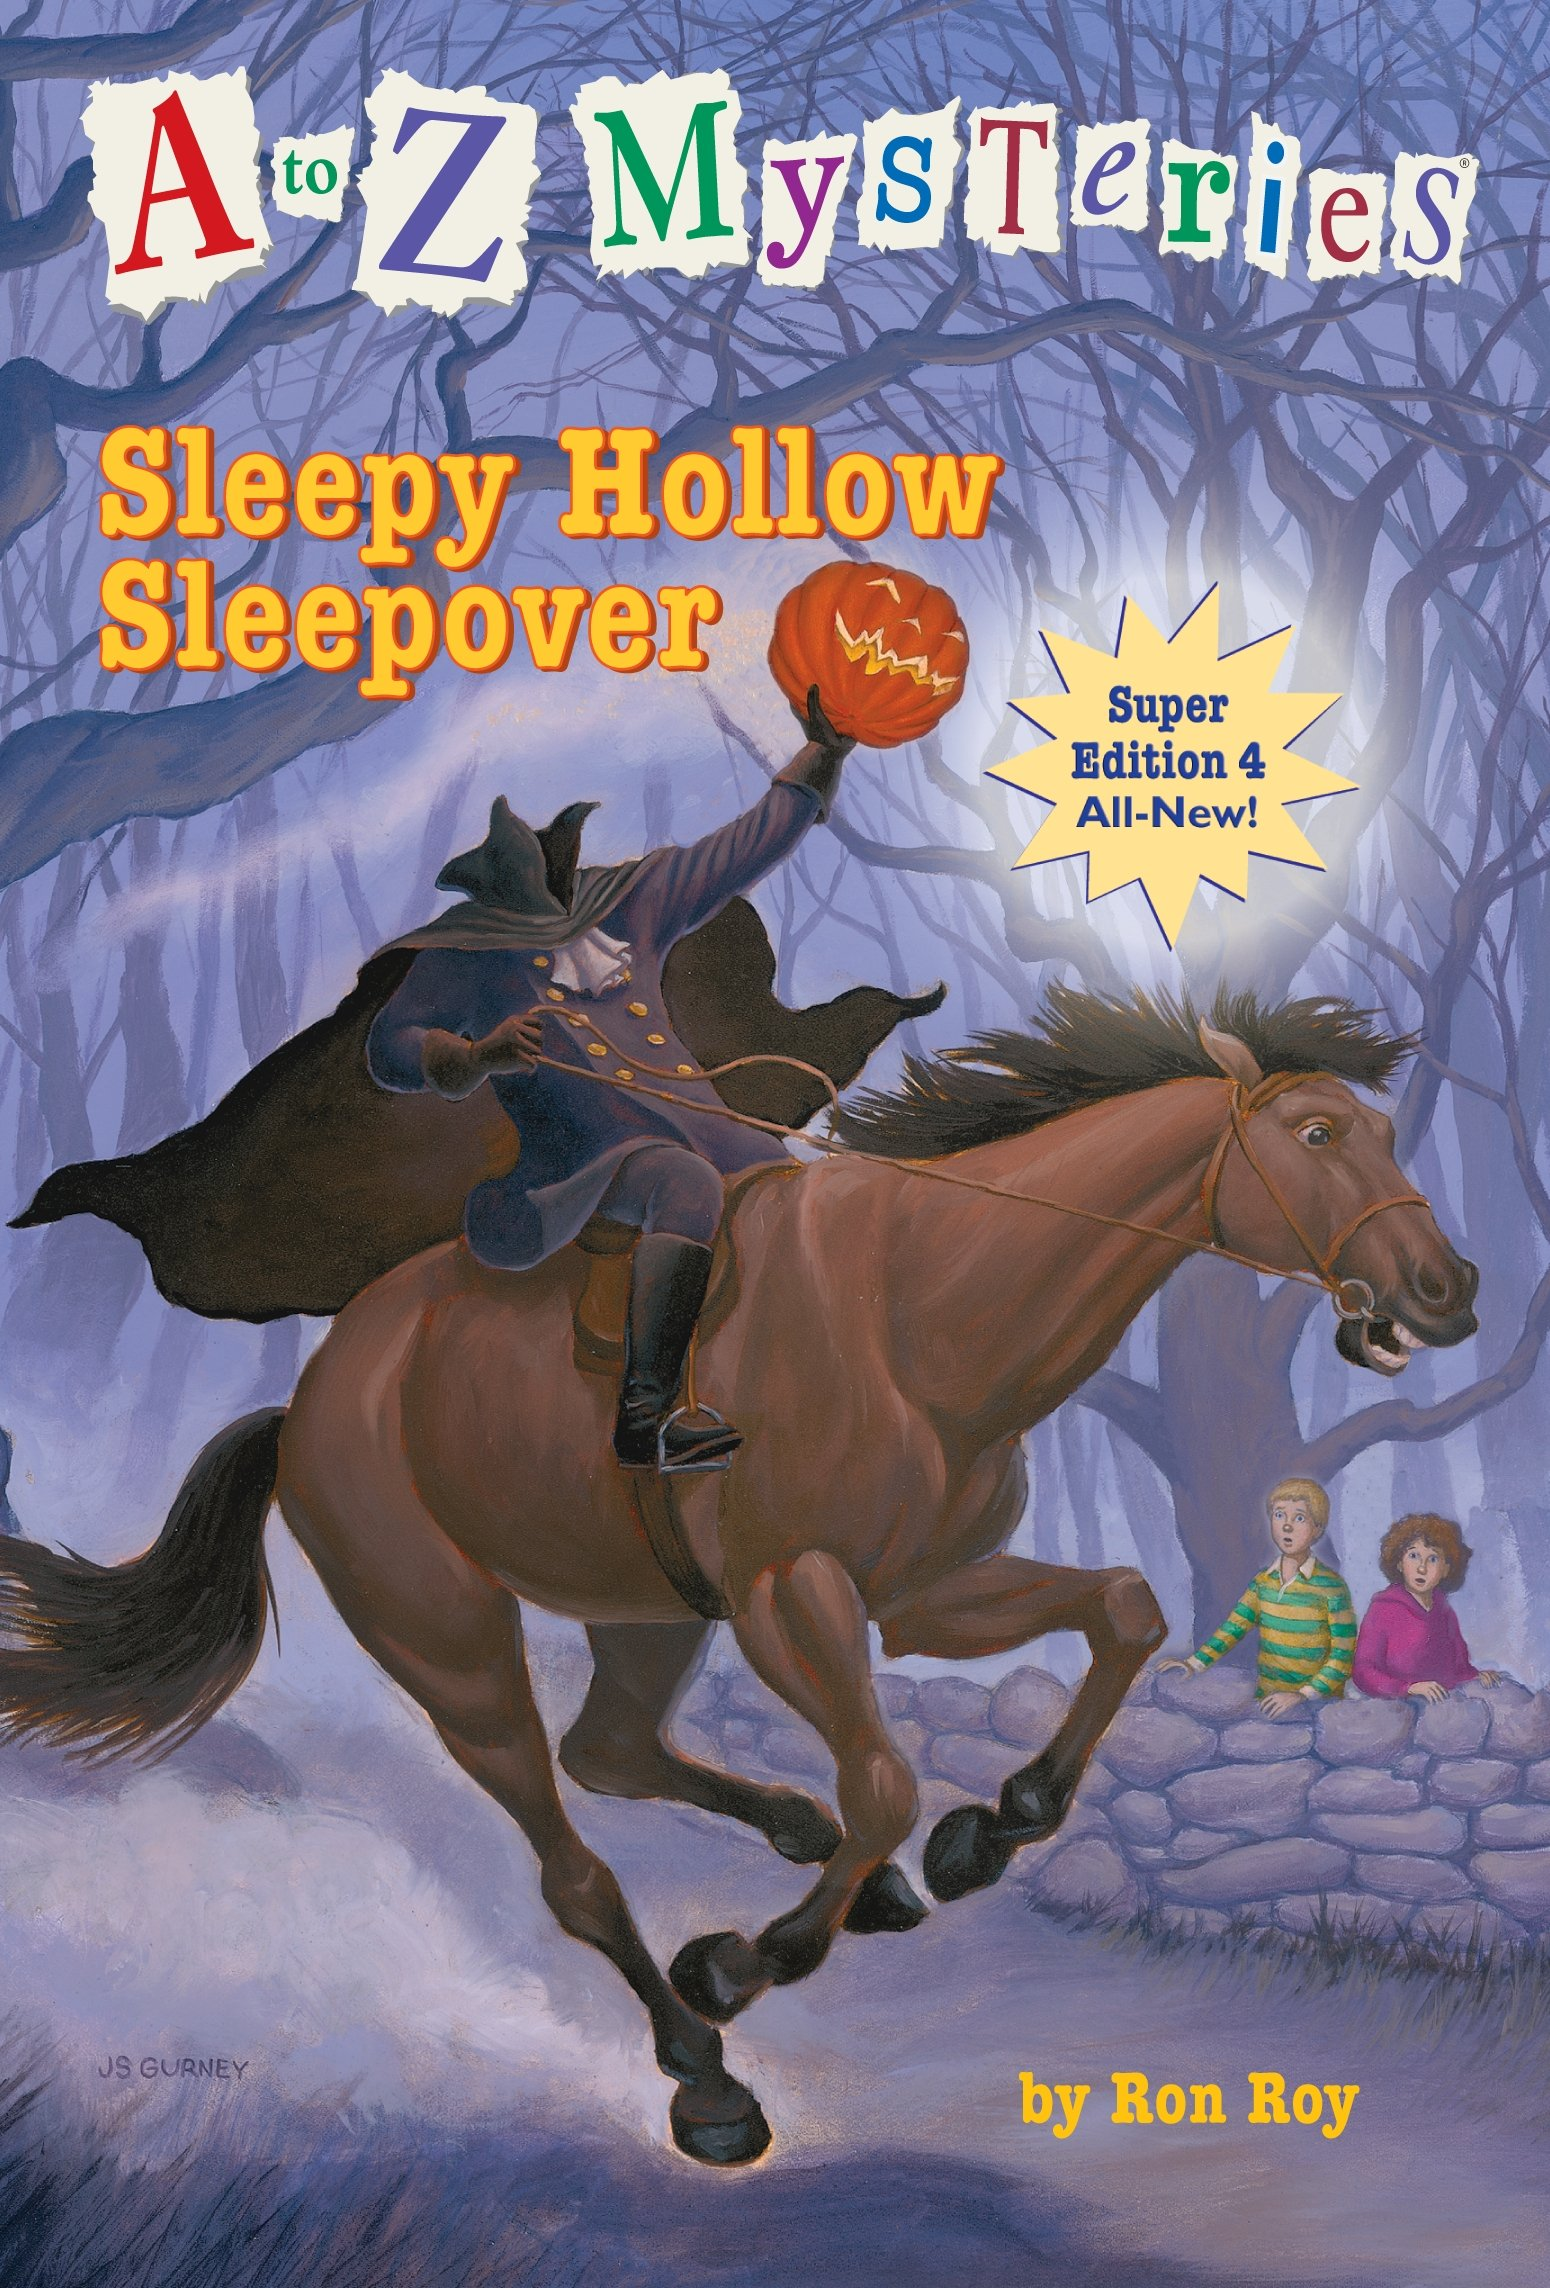 A to Z Mysteries Super Edition #4: Sleepy Hollow Sleepover: 04: Amazon.es: Roy, Ron, Gurney, John Steven: Libros en idiomas extranjeros